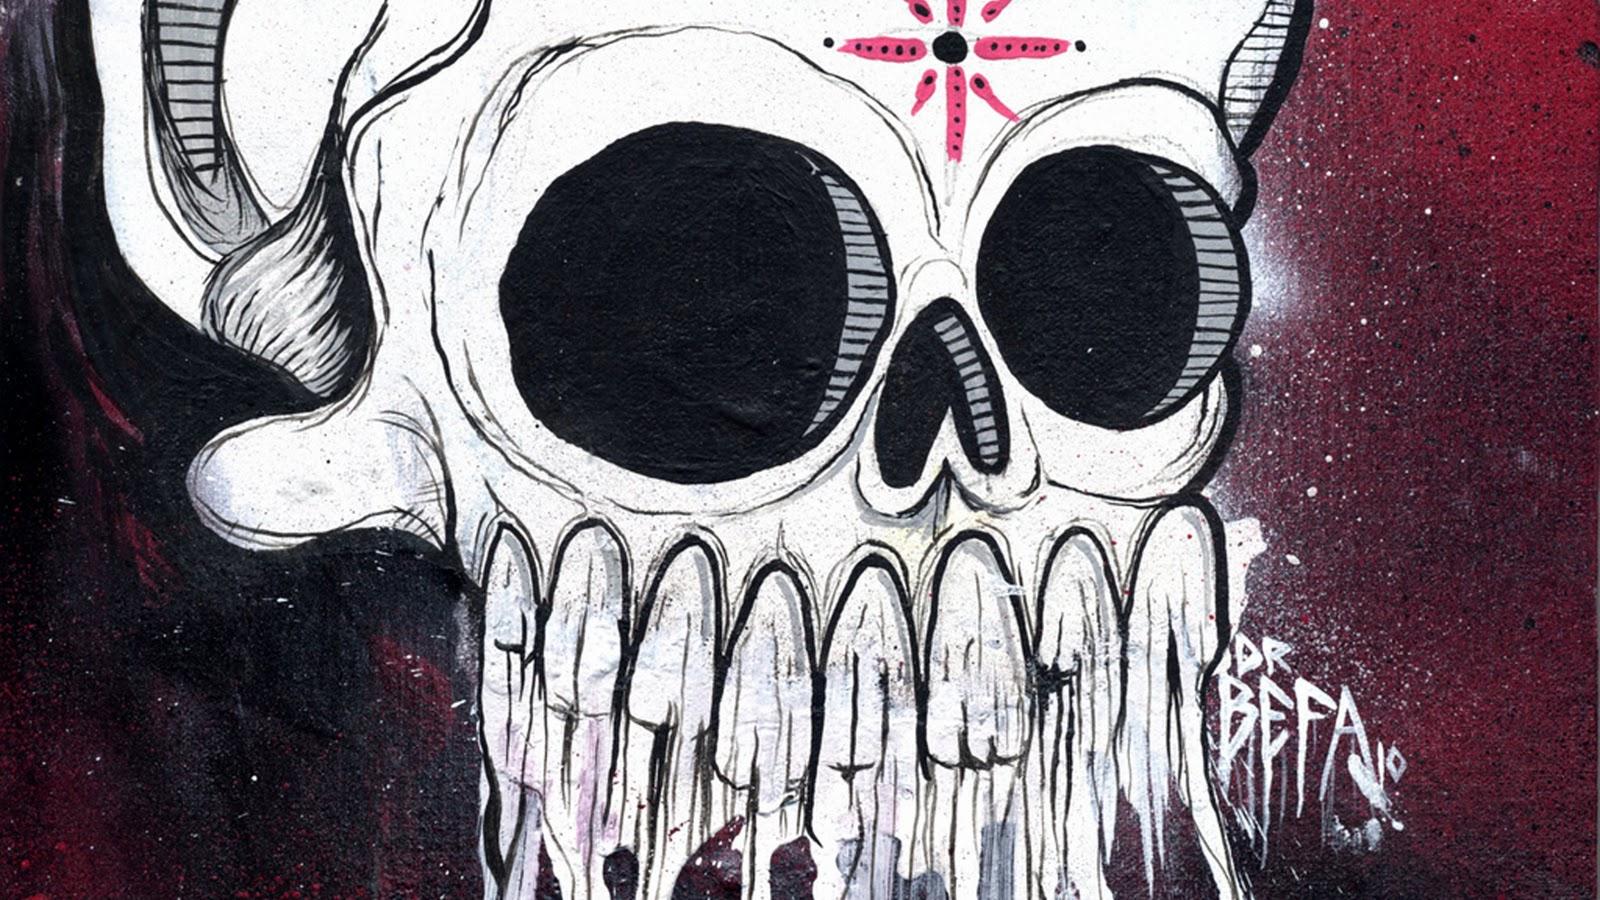 Graffiti art ideas - Skull Graffiti Art Design Ideas